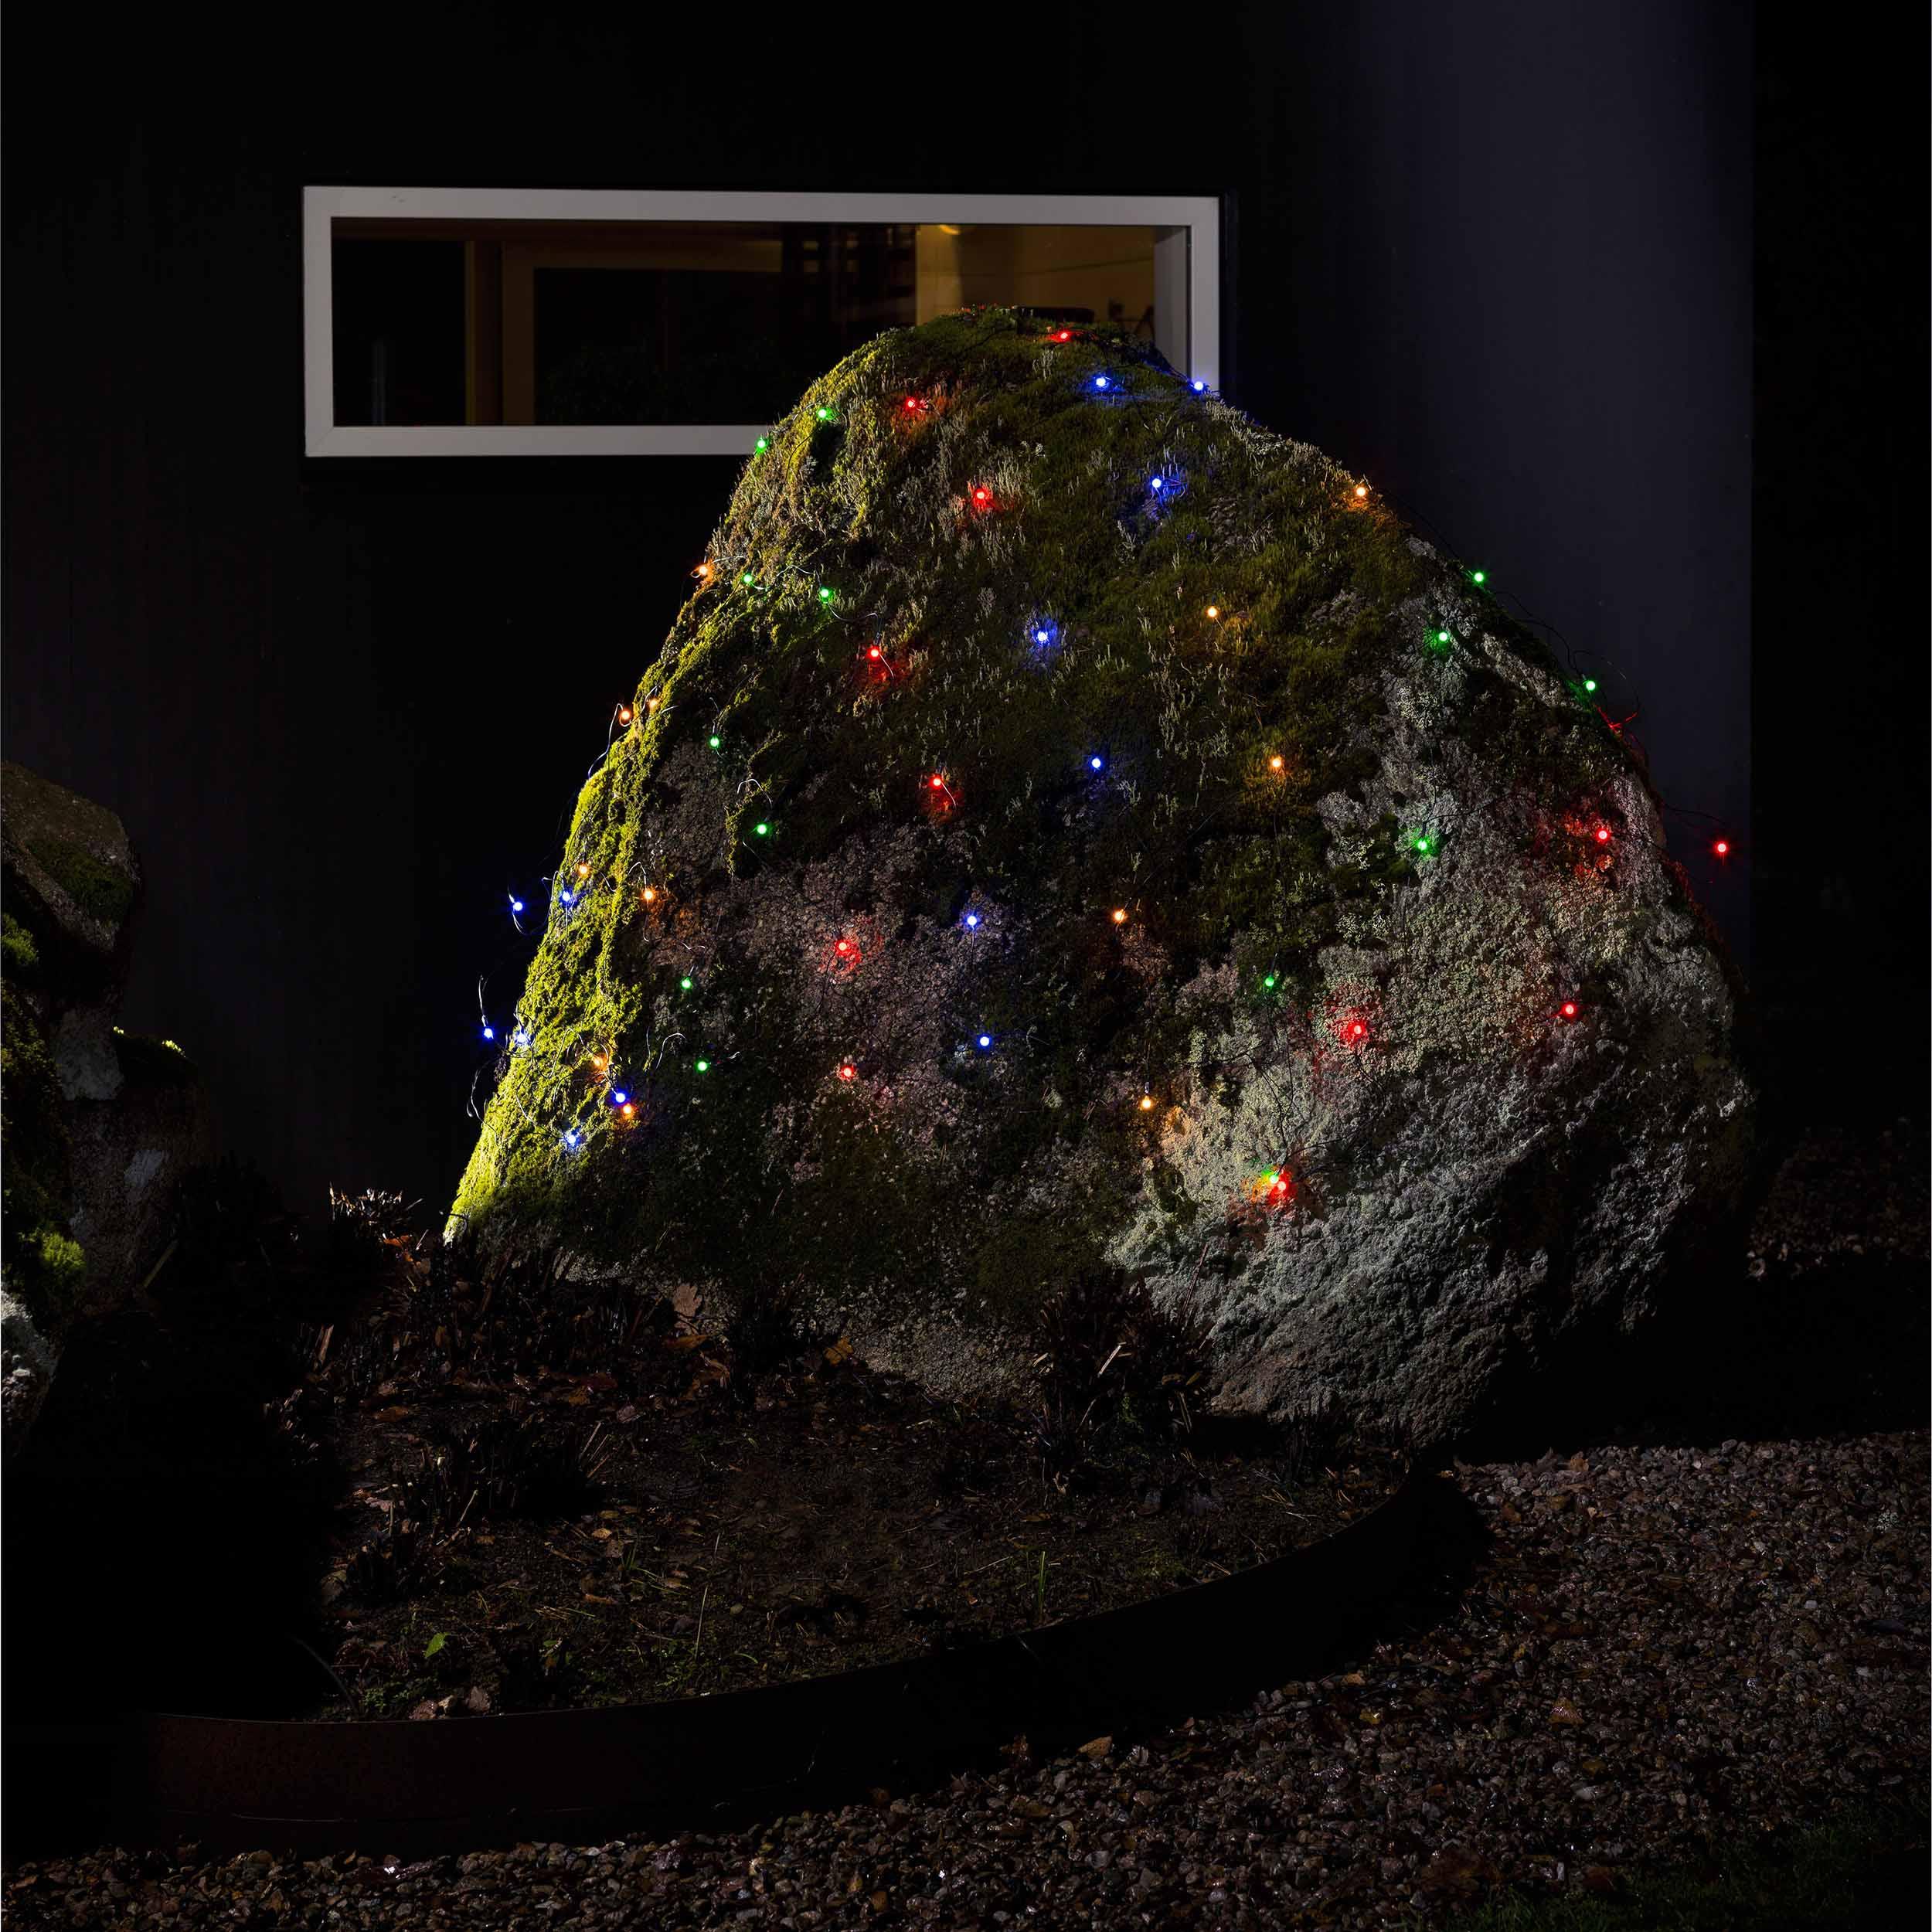 Konstsmide LED-Lichternetz, 80 bunte Globes 3679-507